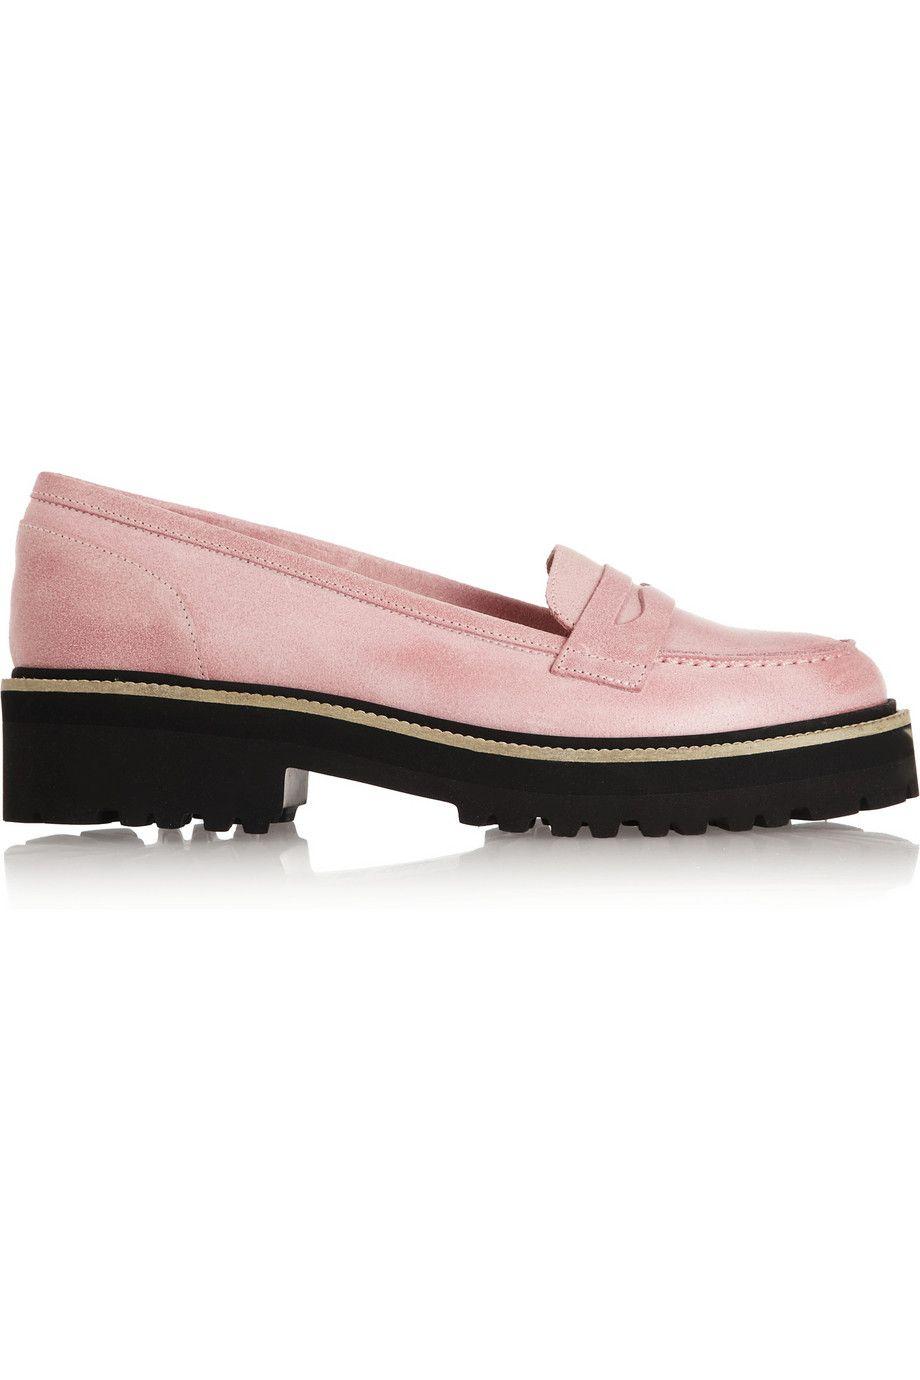 MM6 Maison Martin Margiela|Leather loafers